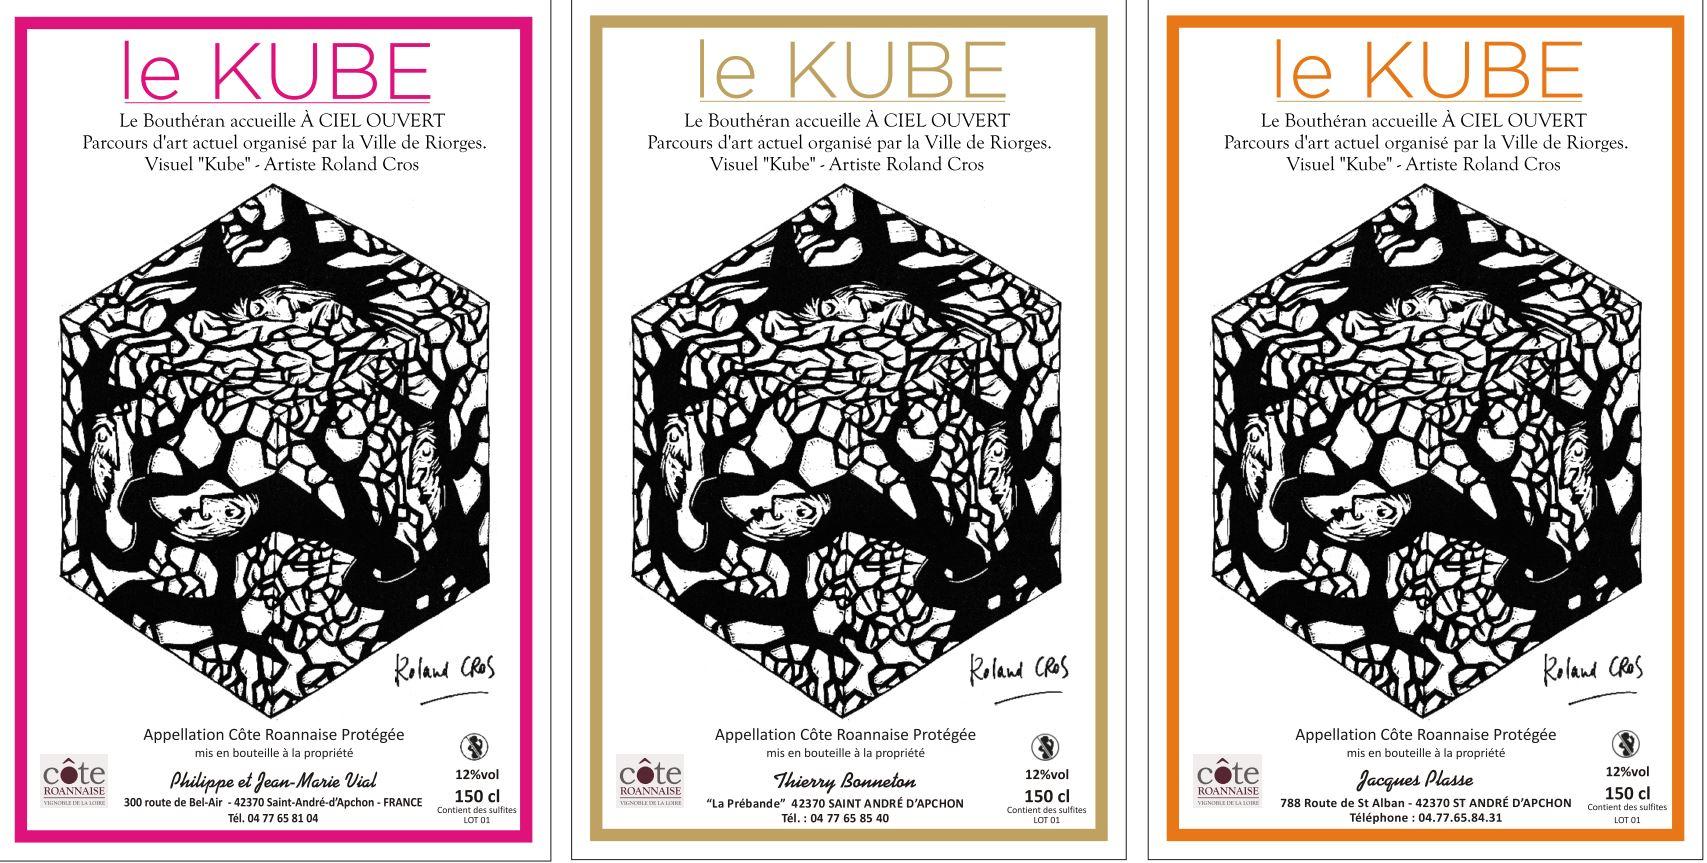 Capture-etiquette-kube-1525898410.JPG